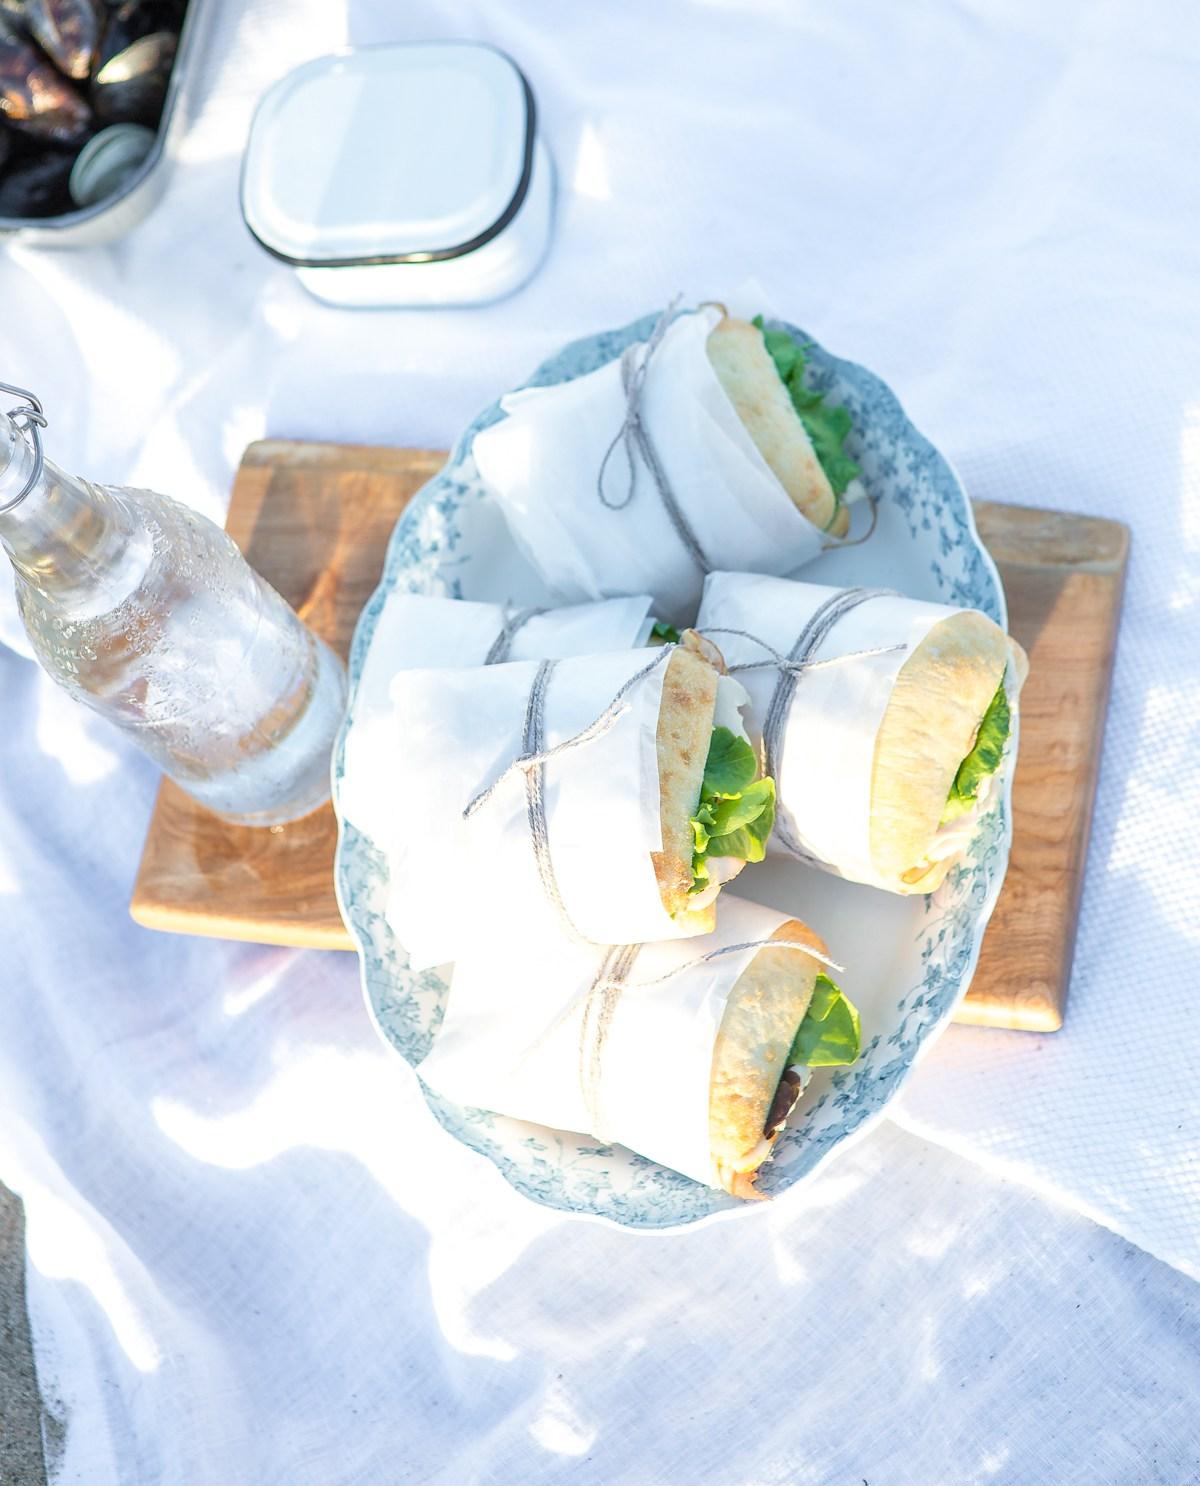 Beach picnic - sandwiches on a cutting board